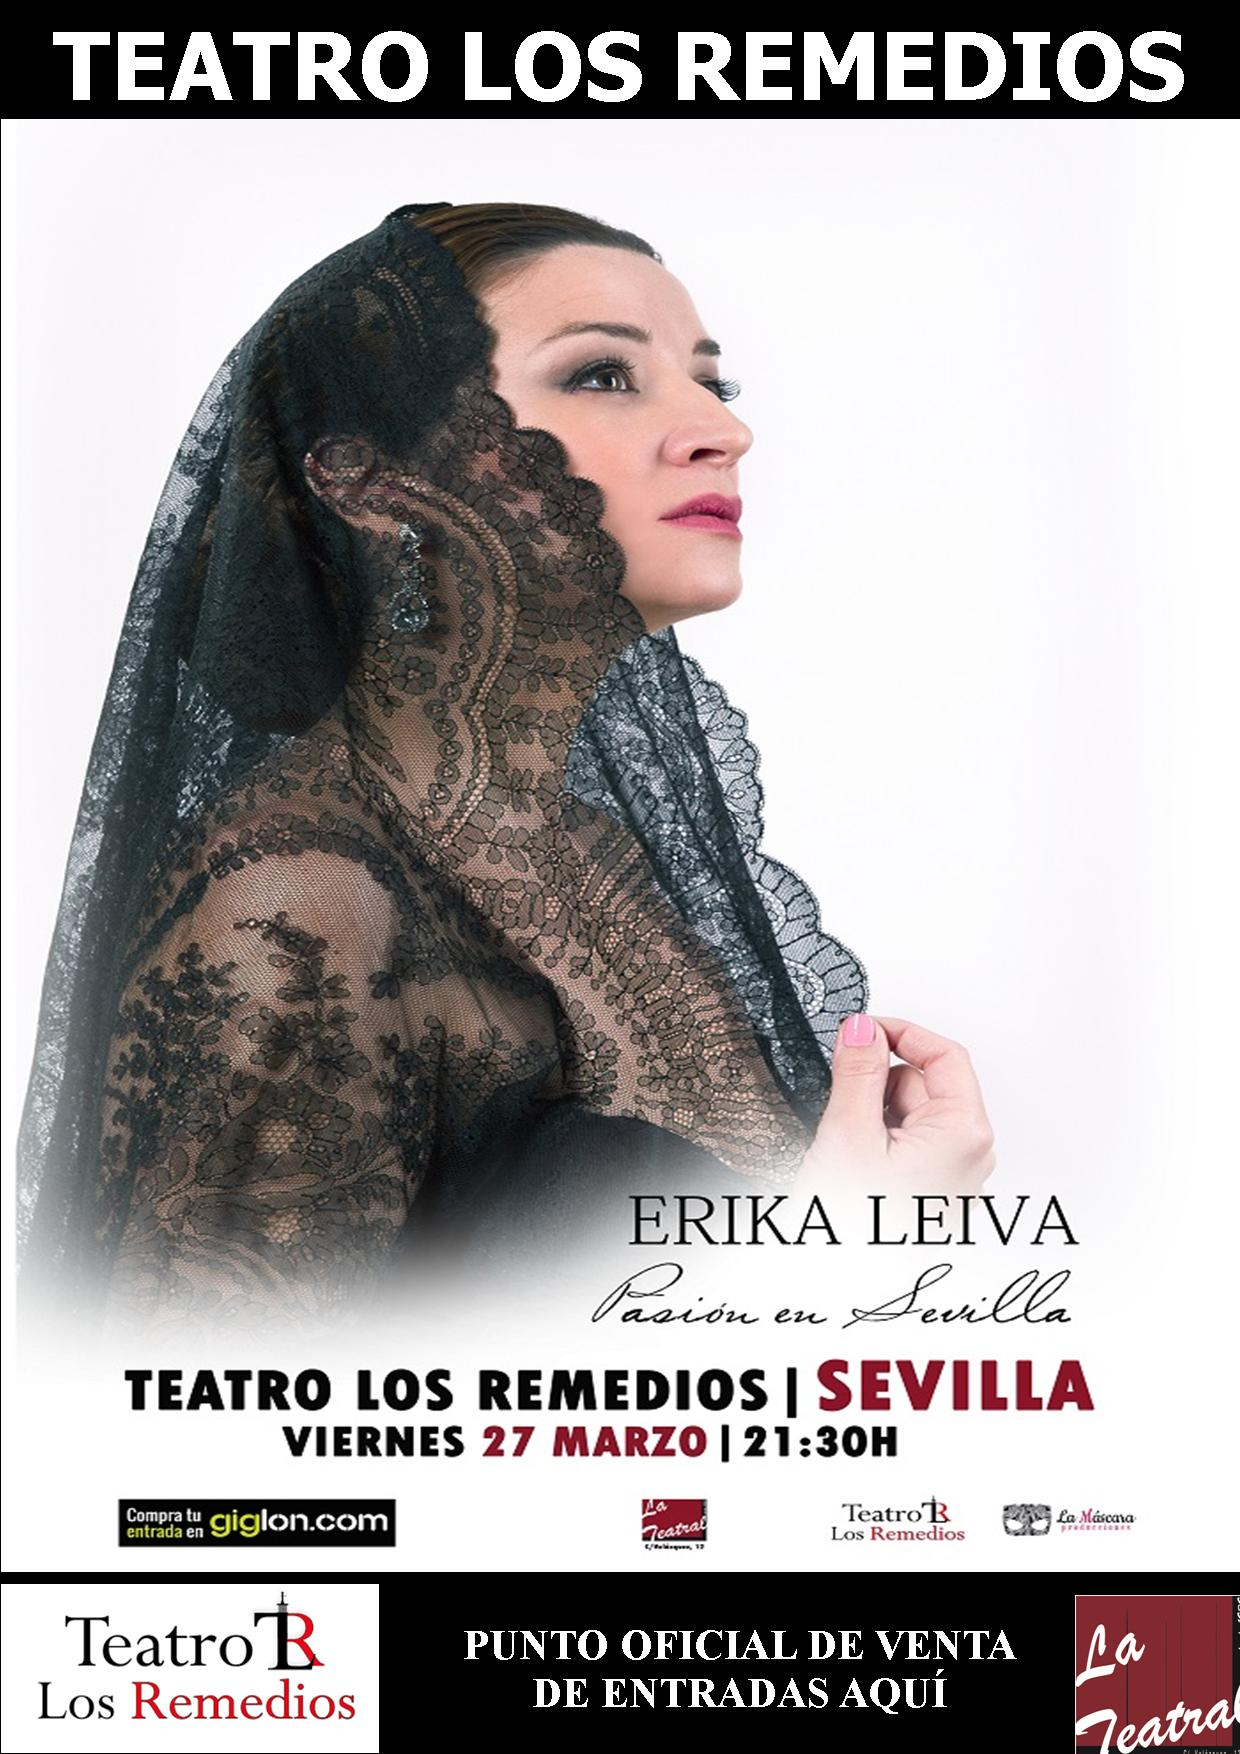 Teatro los remedios - Erika Leiva